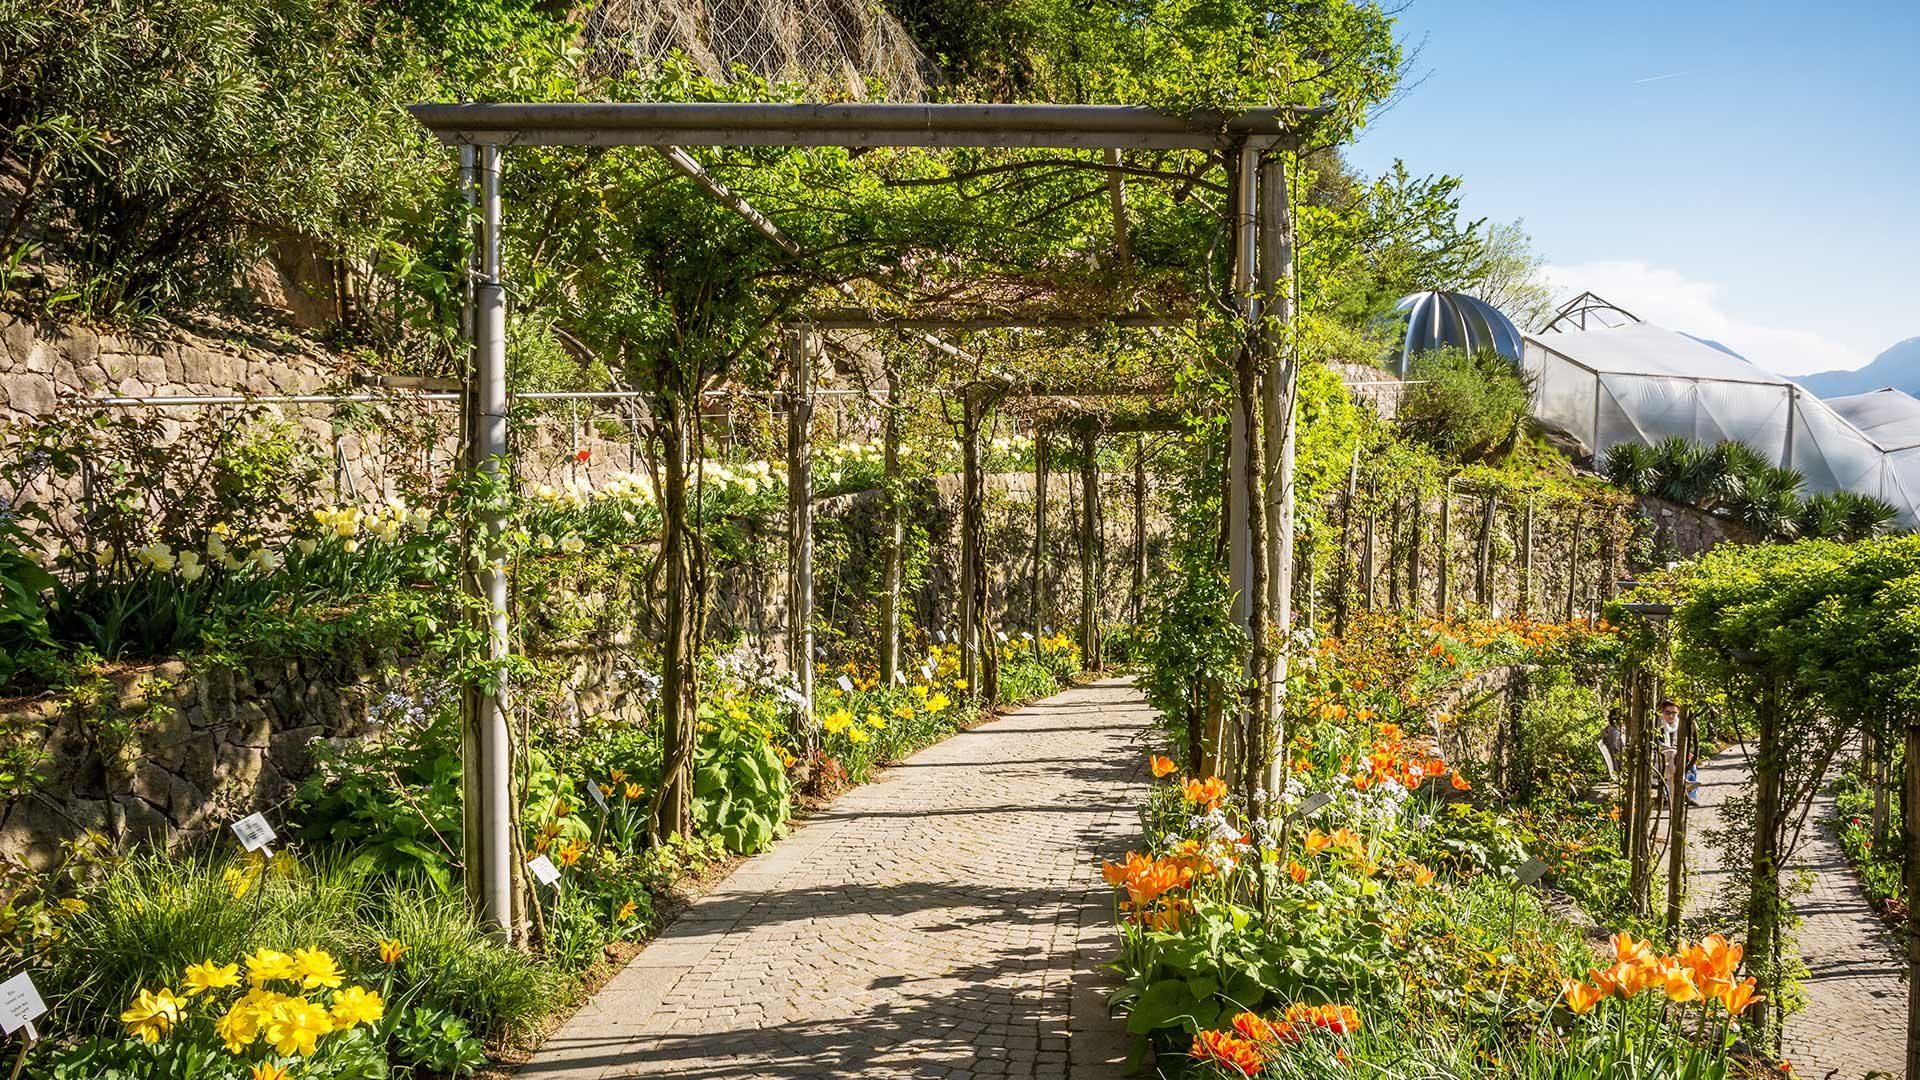 Fiori - Giardini di Castel Trauttmansdorff